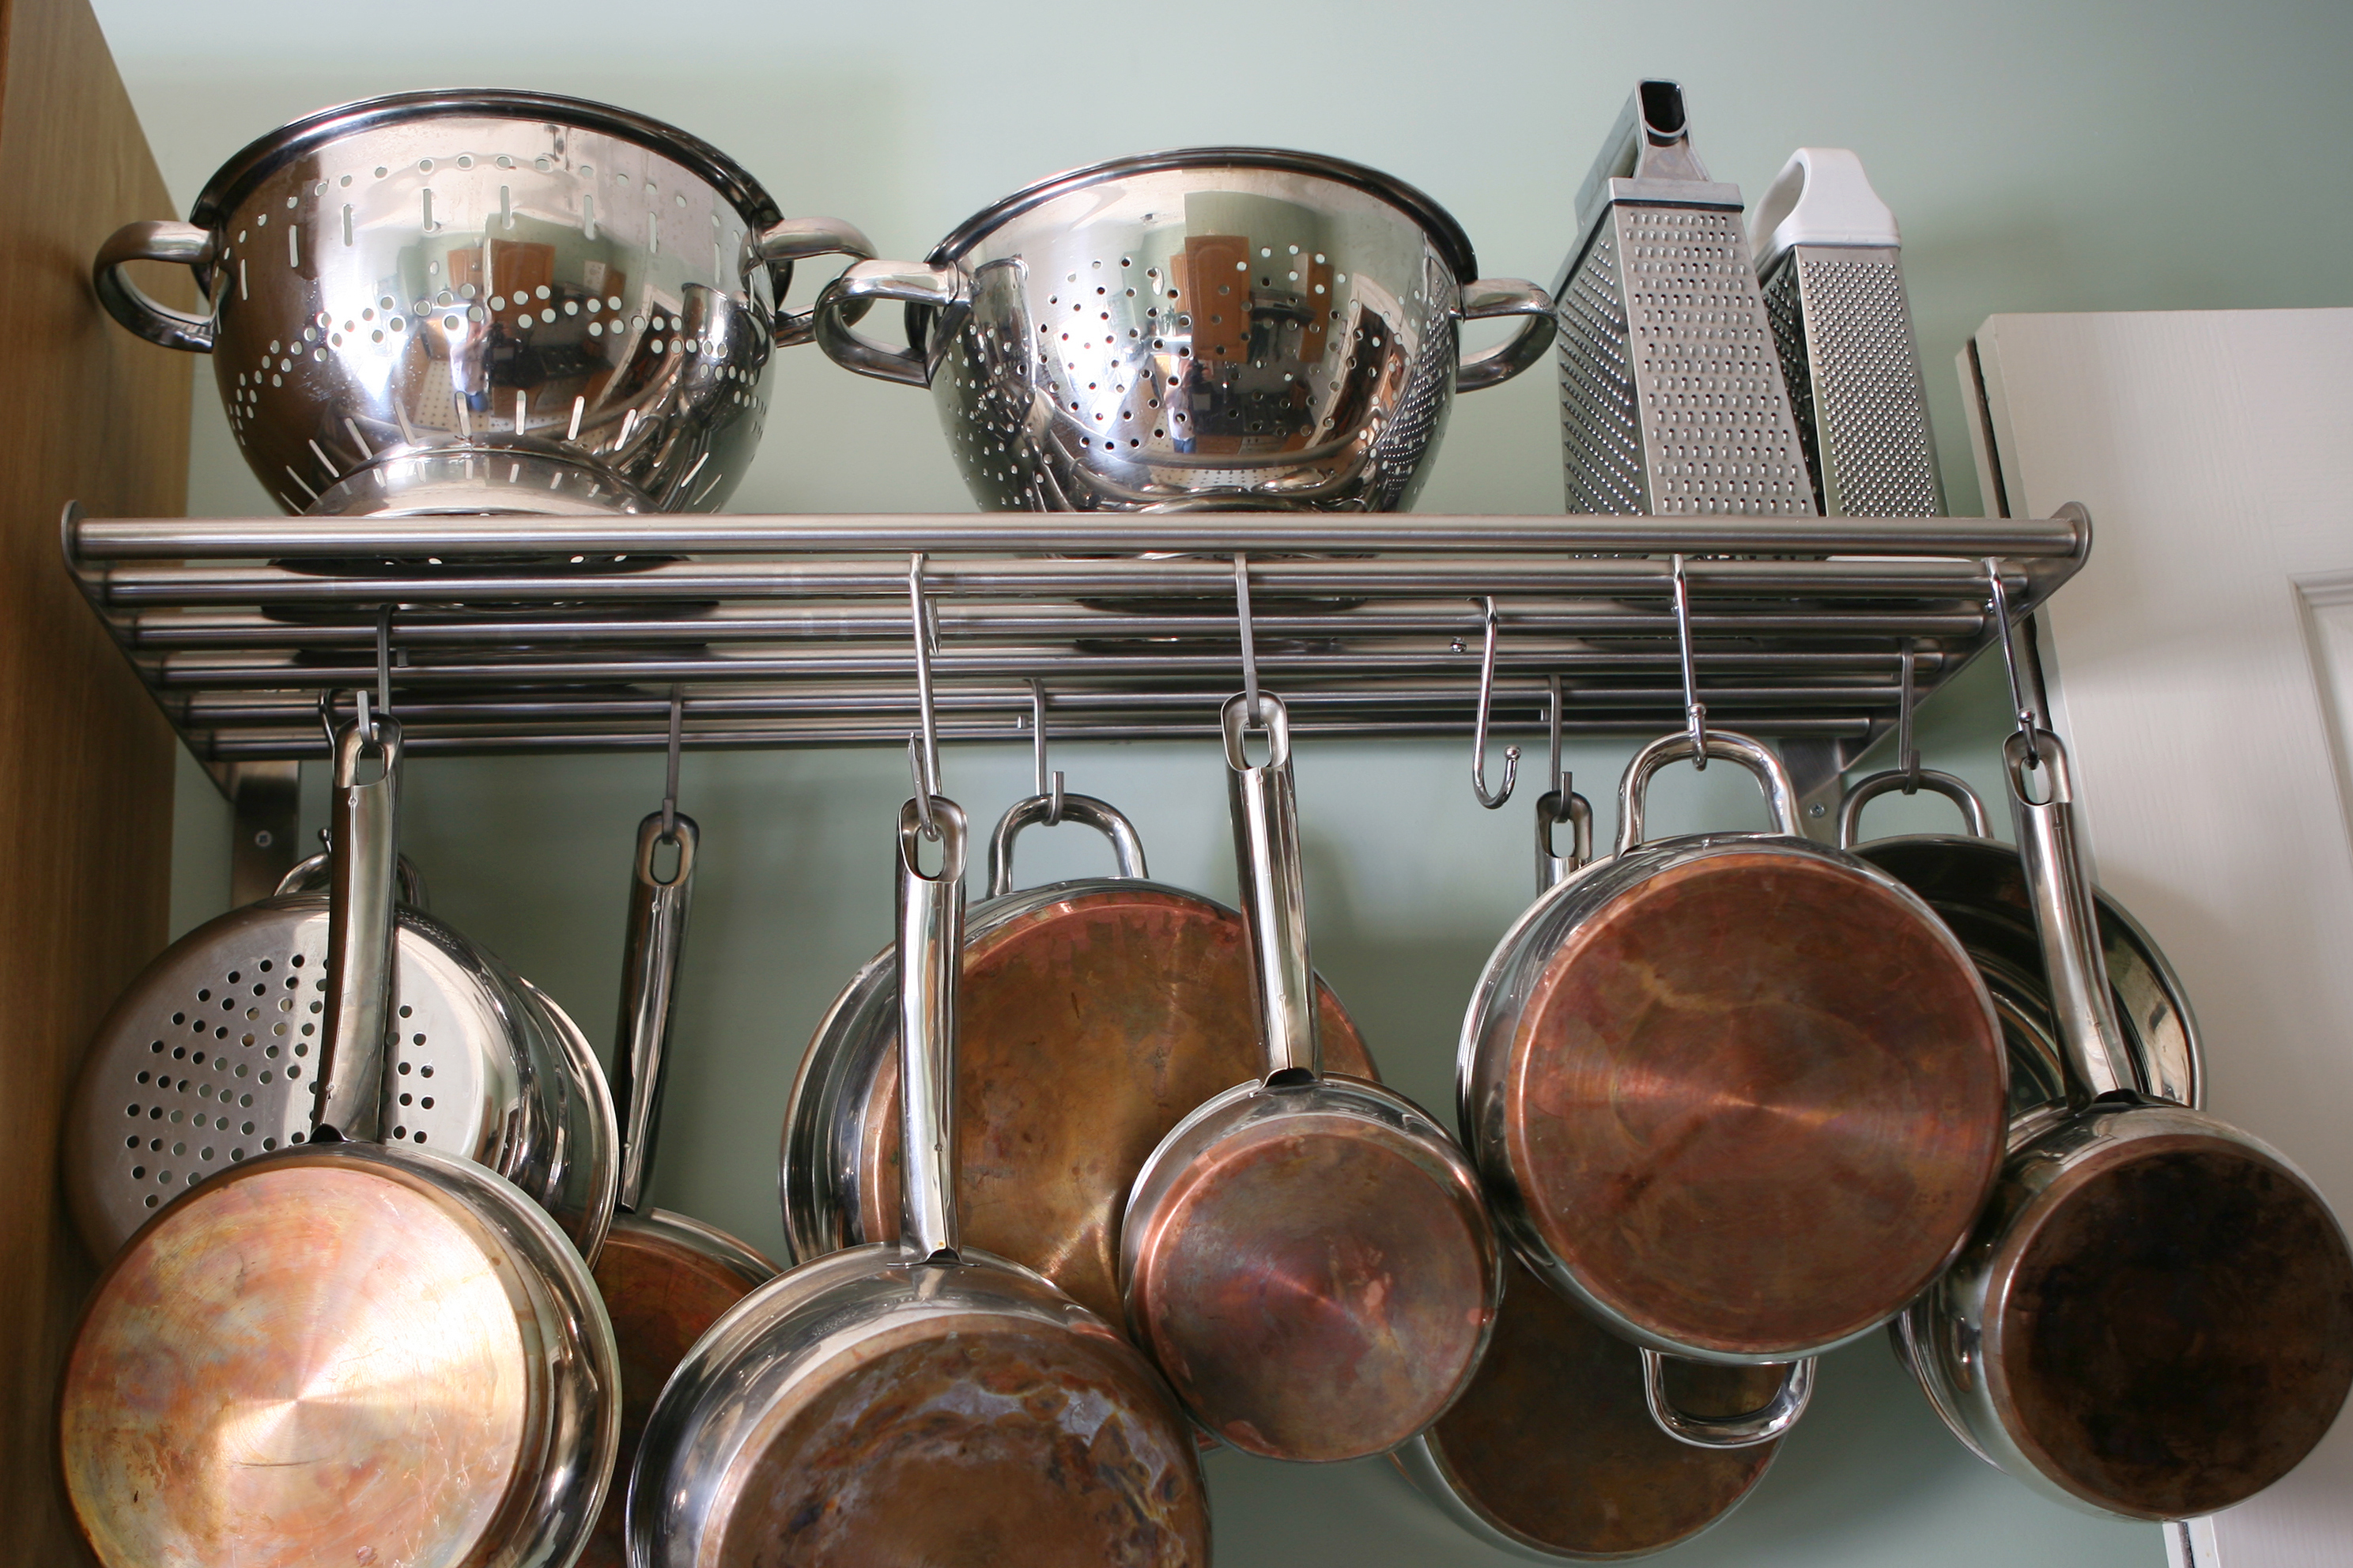 pot rack   diy pot rack   kitchen   space   kitchen space   organization   kitchen organization   design   kitchen design   diy